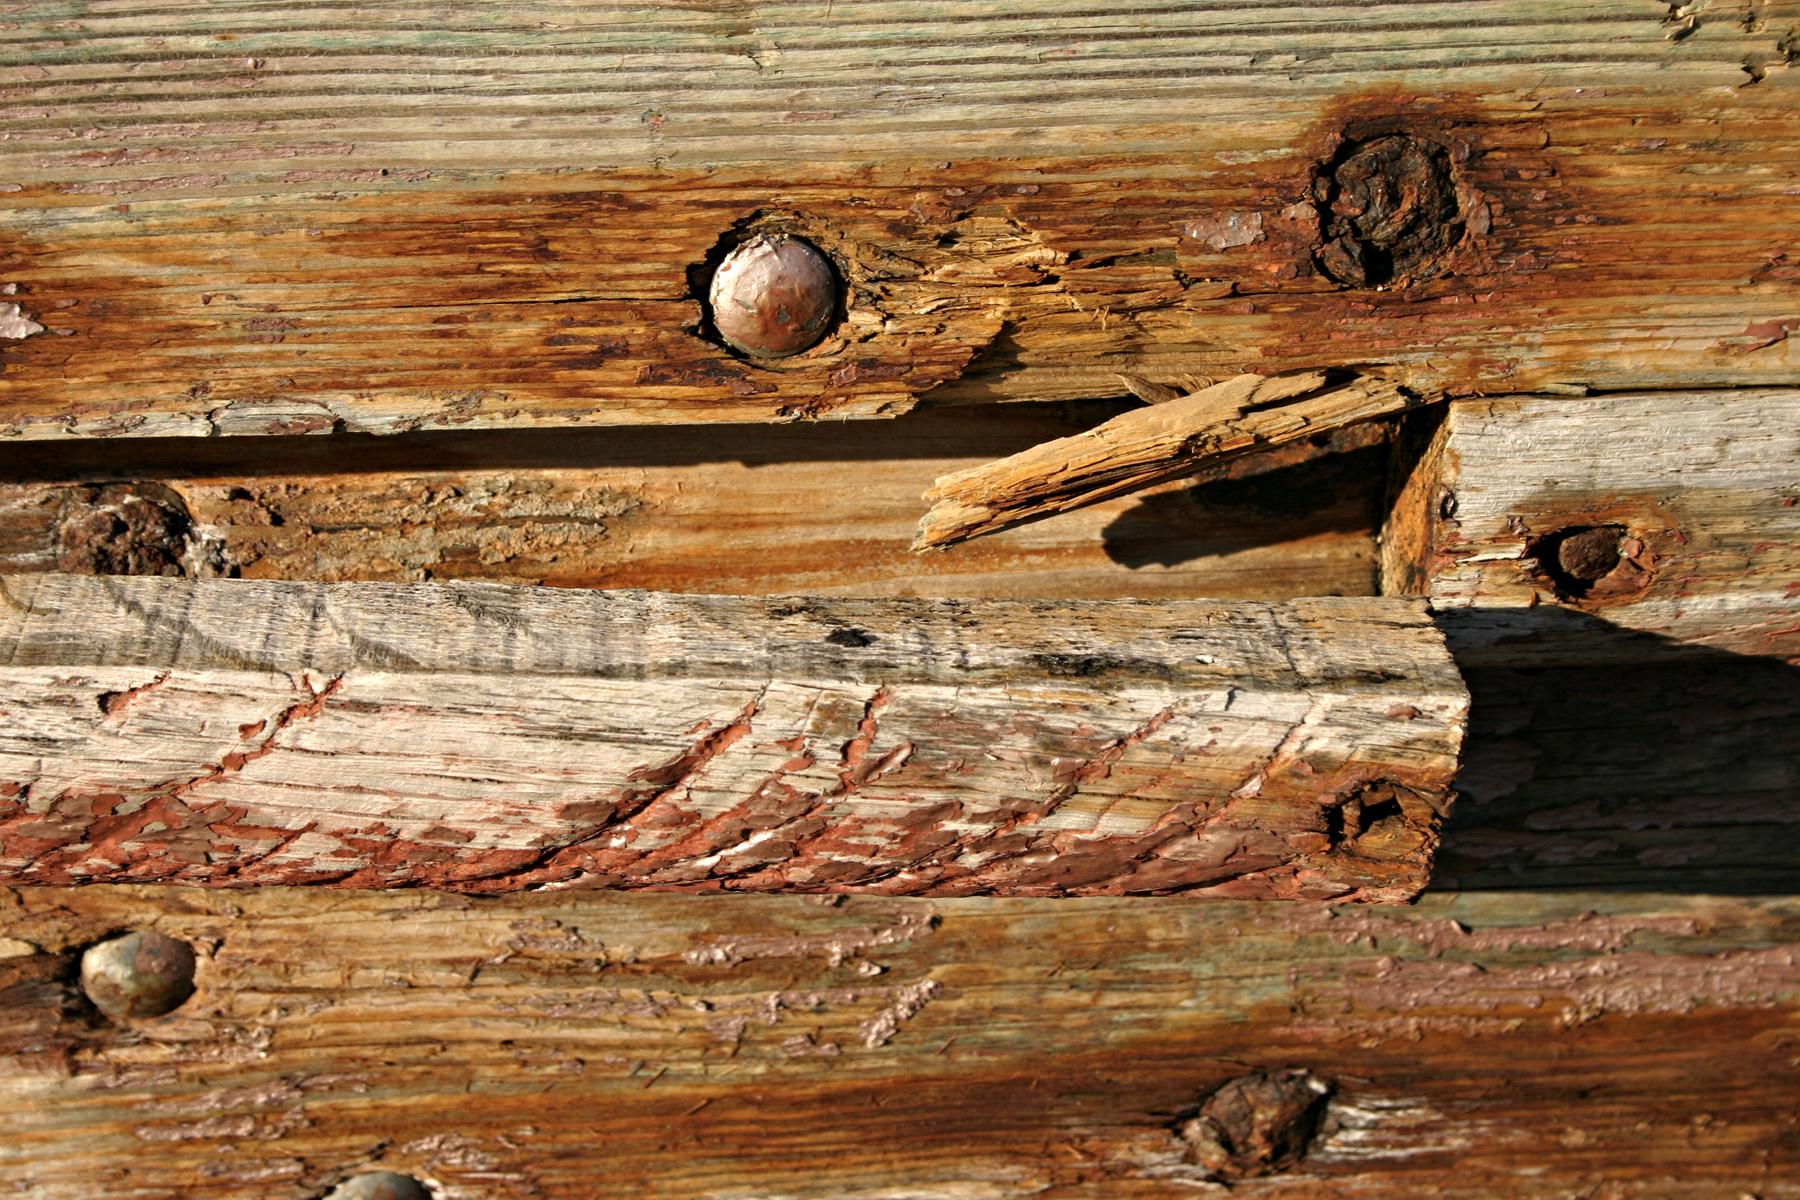 Old wood texture, Abstract, Broken, Cracked, Nail, HQ Photo